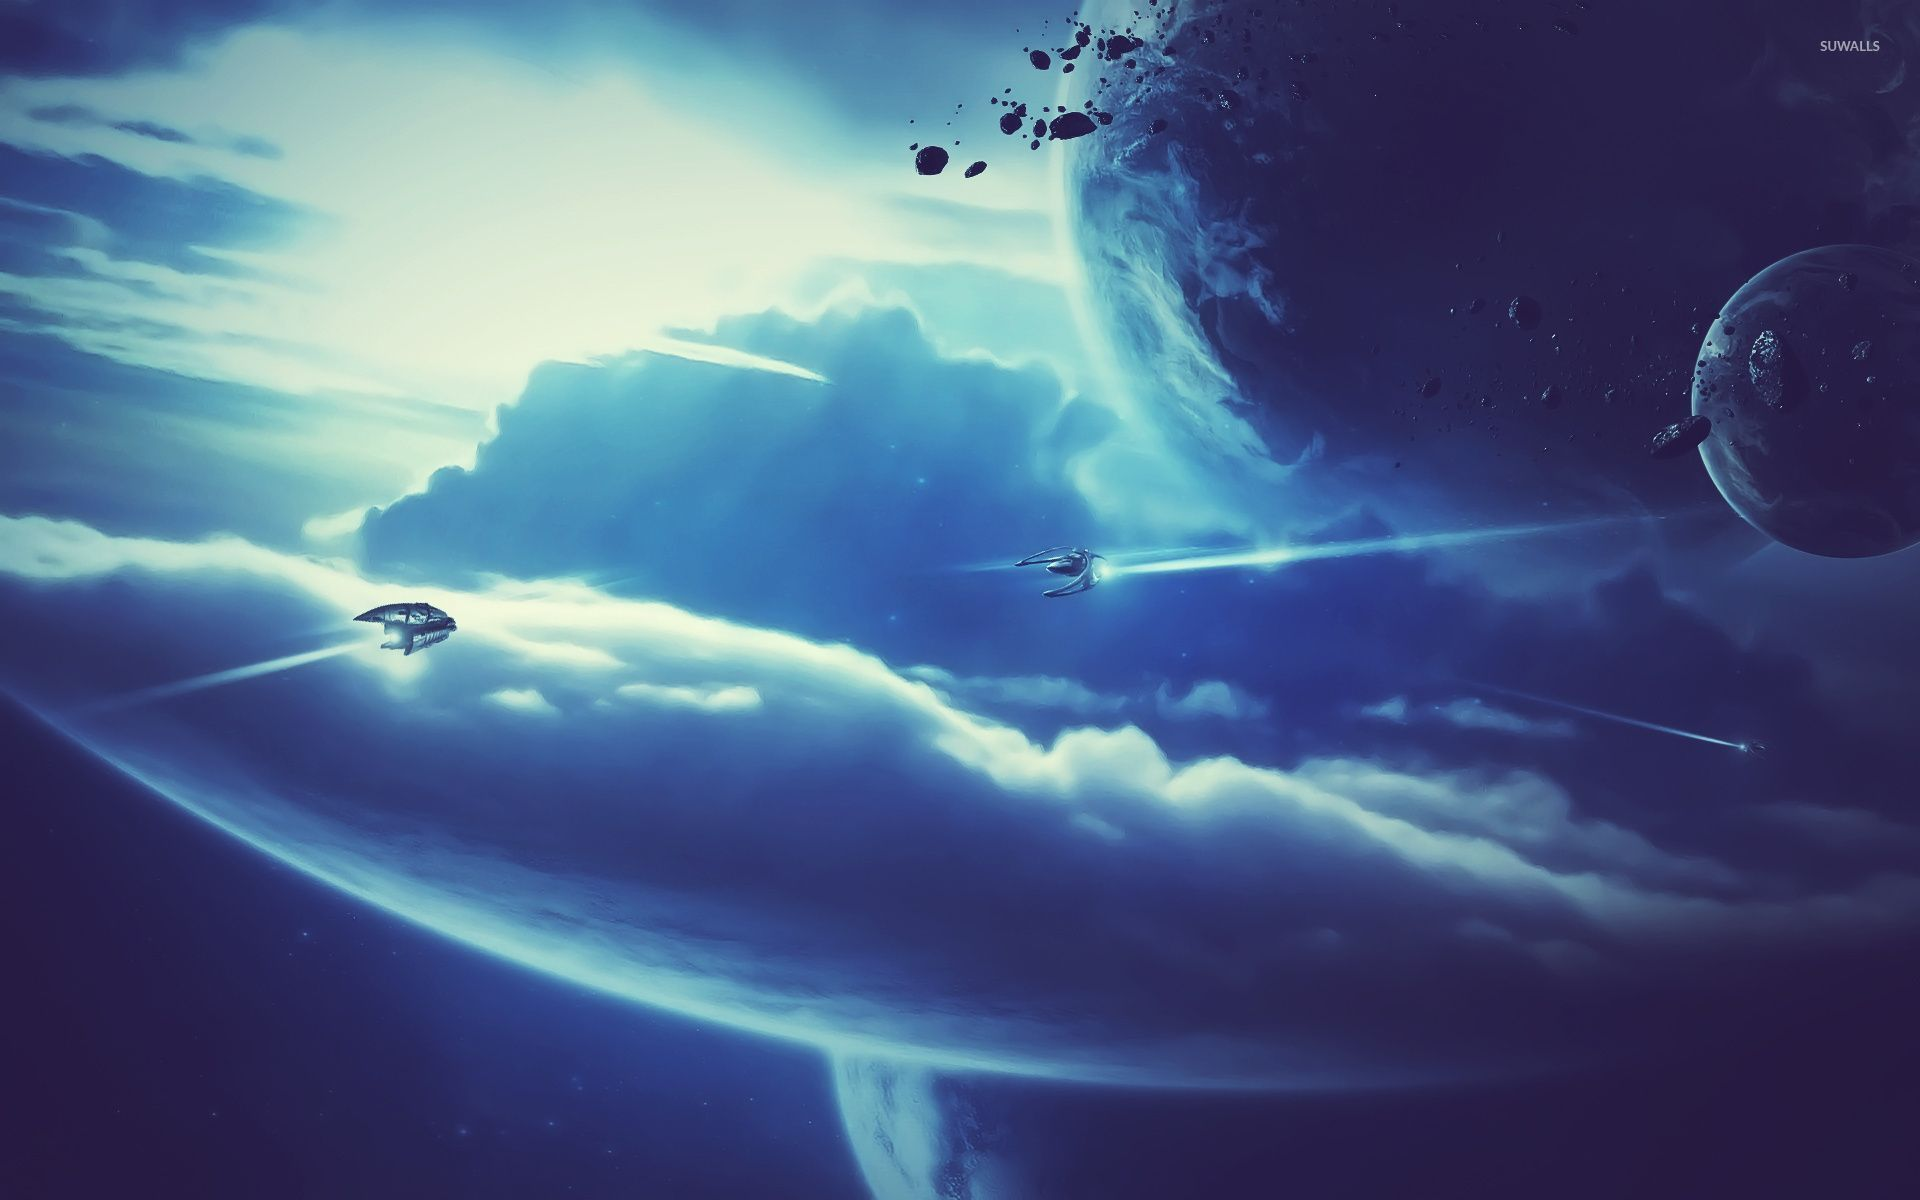 spaceships wallpaper fantasy wallpapers 32838